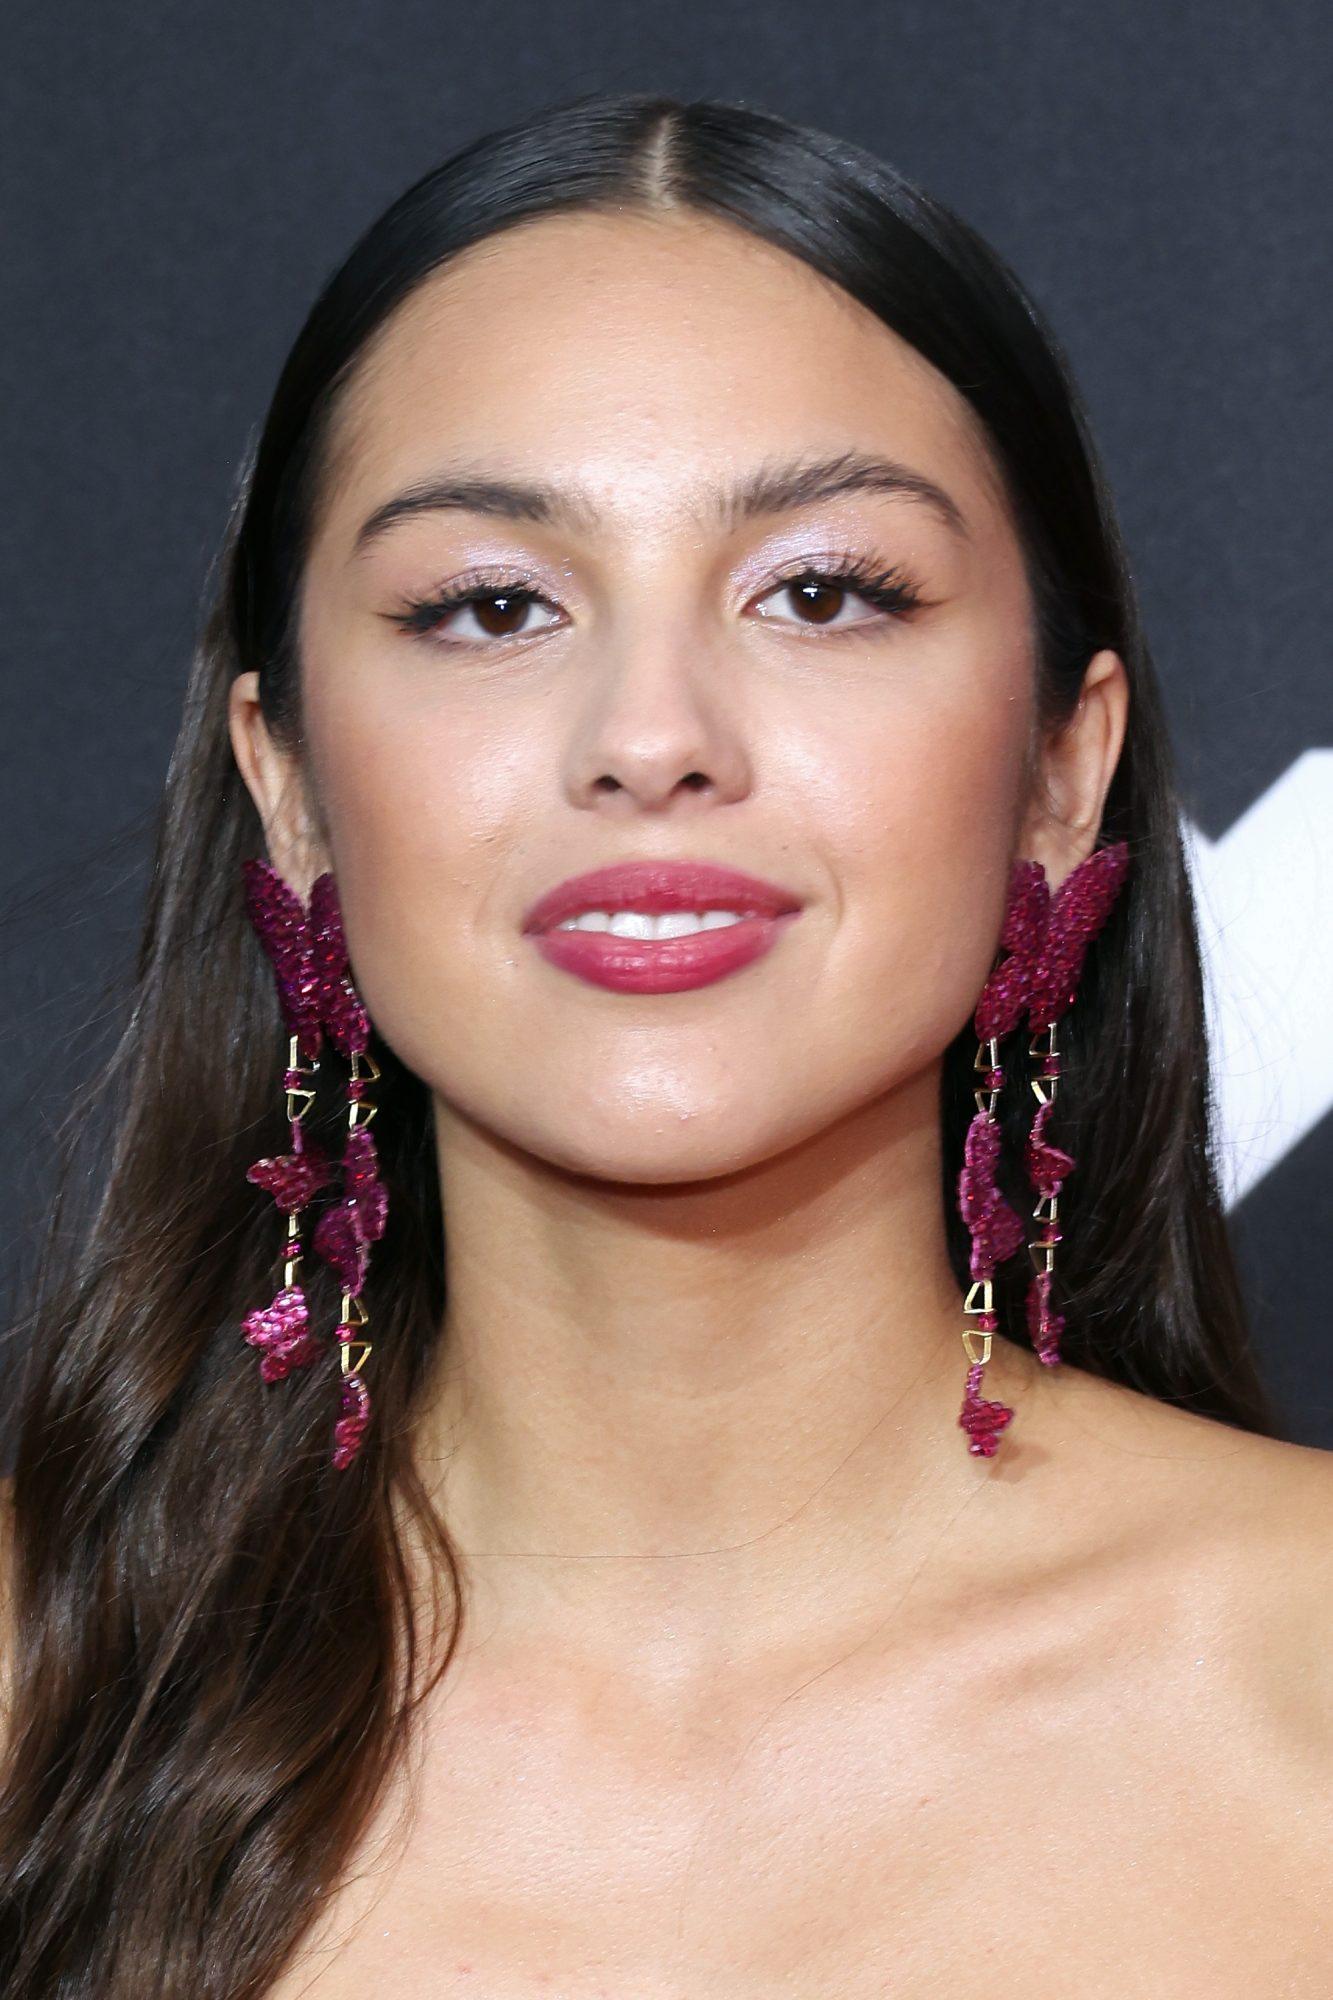 MTV VMA looks del belleza, Olivia Rodrigo